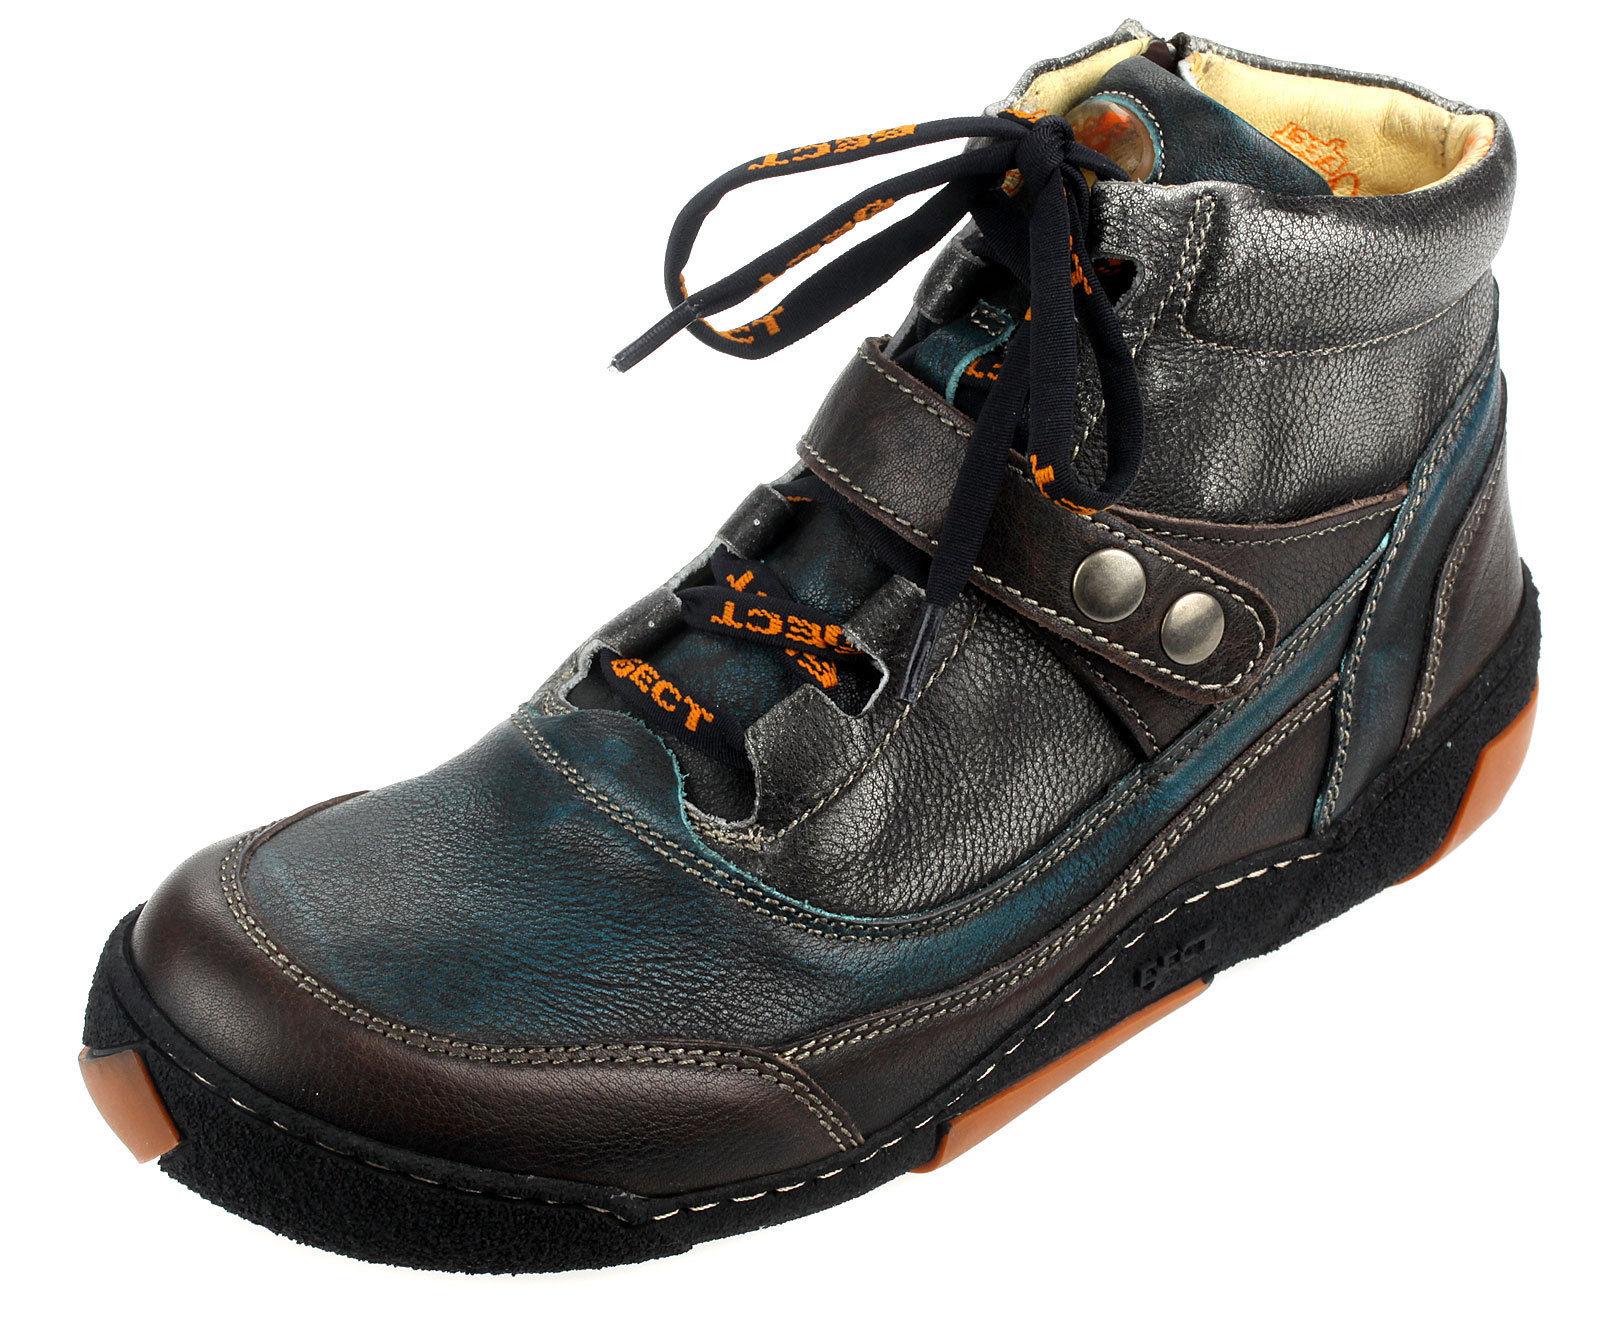 Eject Herrenstiefel Echtleder Boots Freizeit Männer Comfort Schuhe 19122